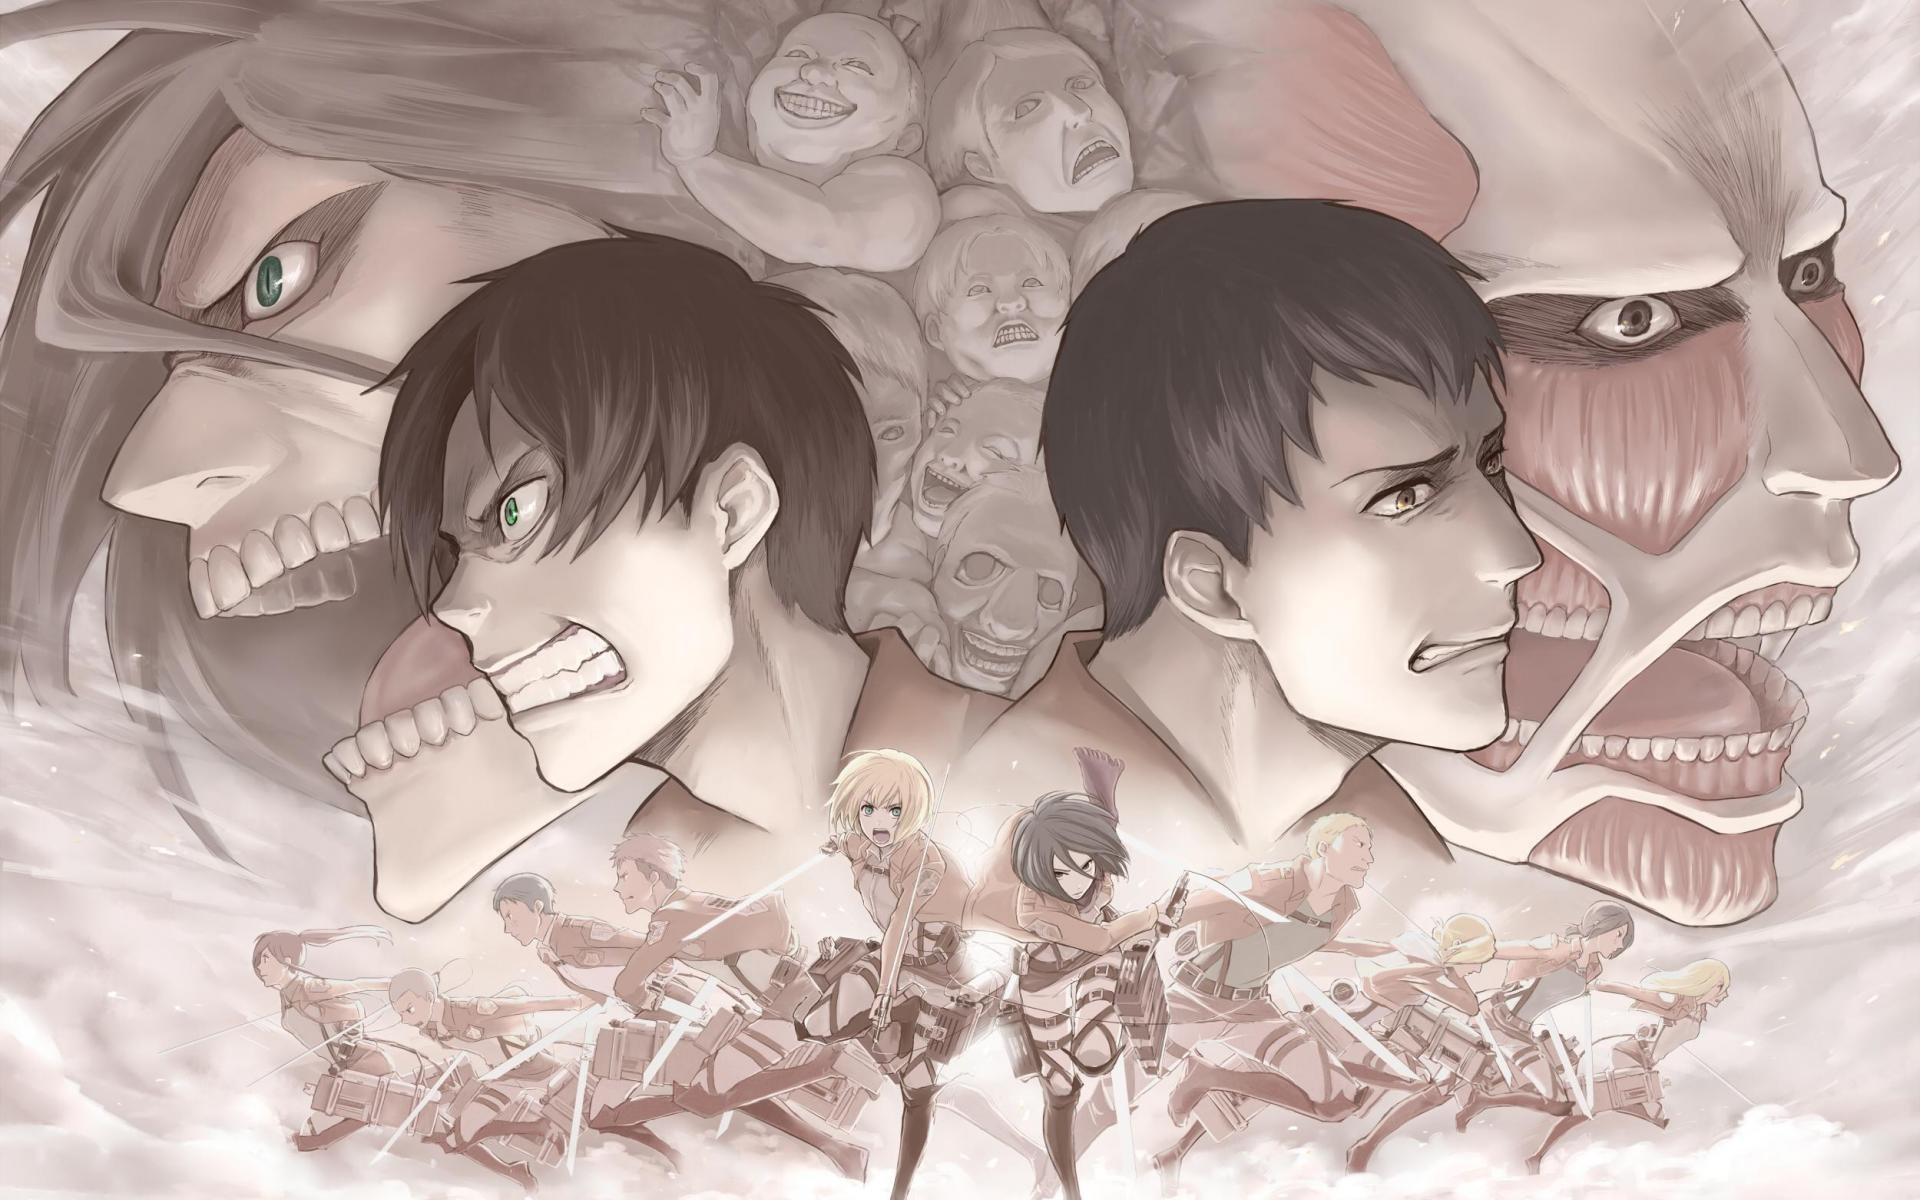 Wallpaper Gambar Ilustrasi Gadis Anime Anak Laki Laki Anime